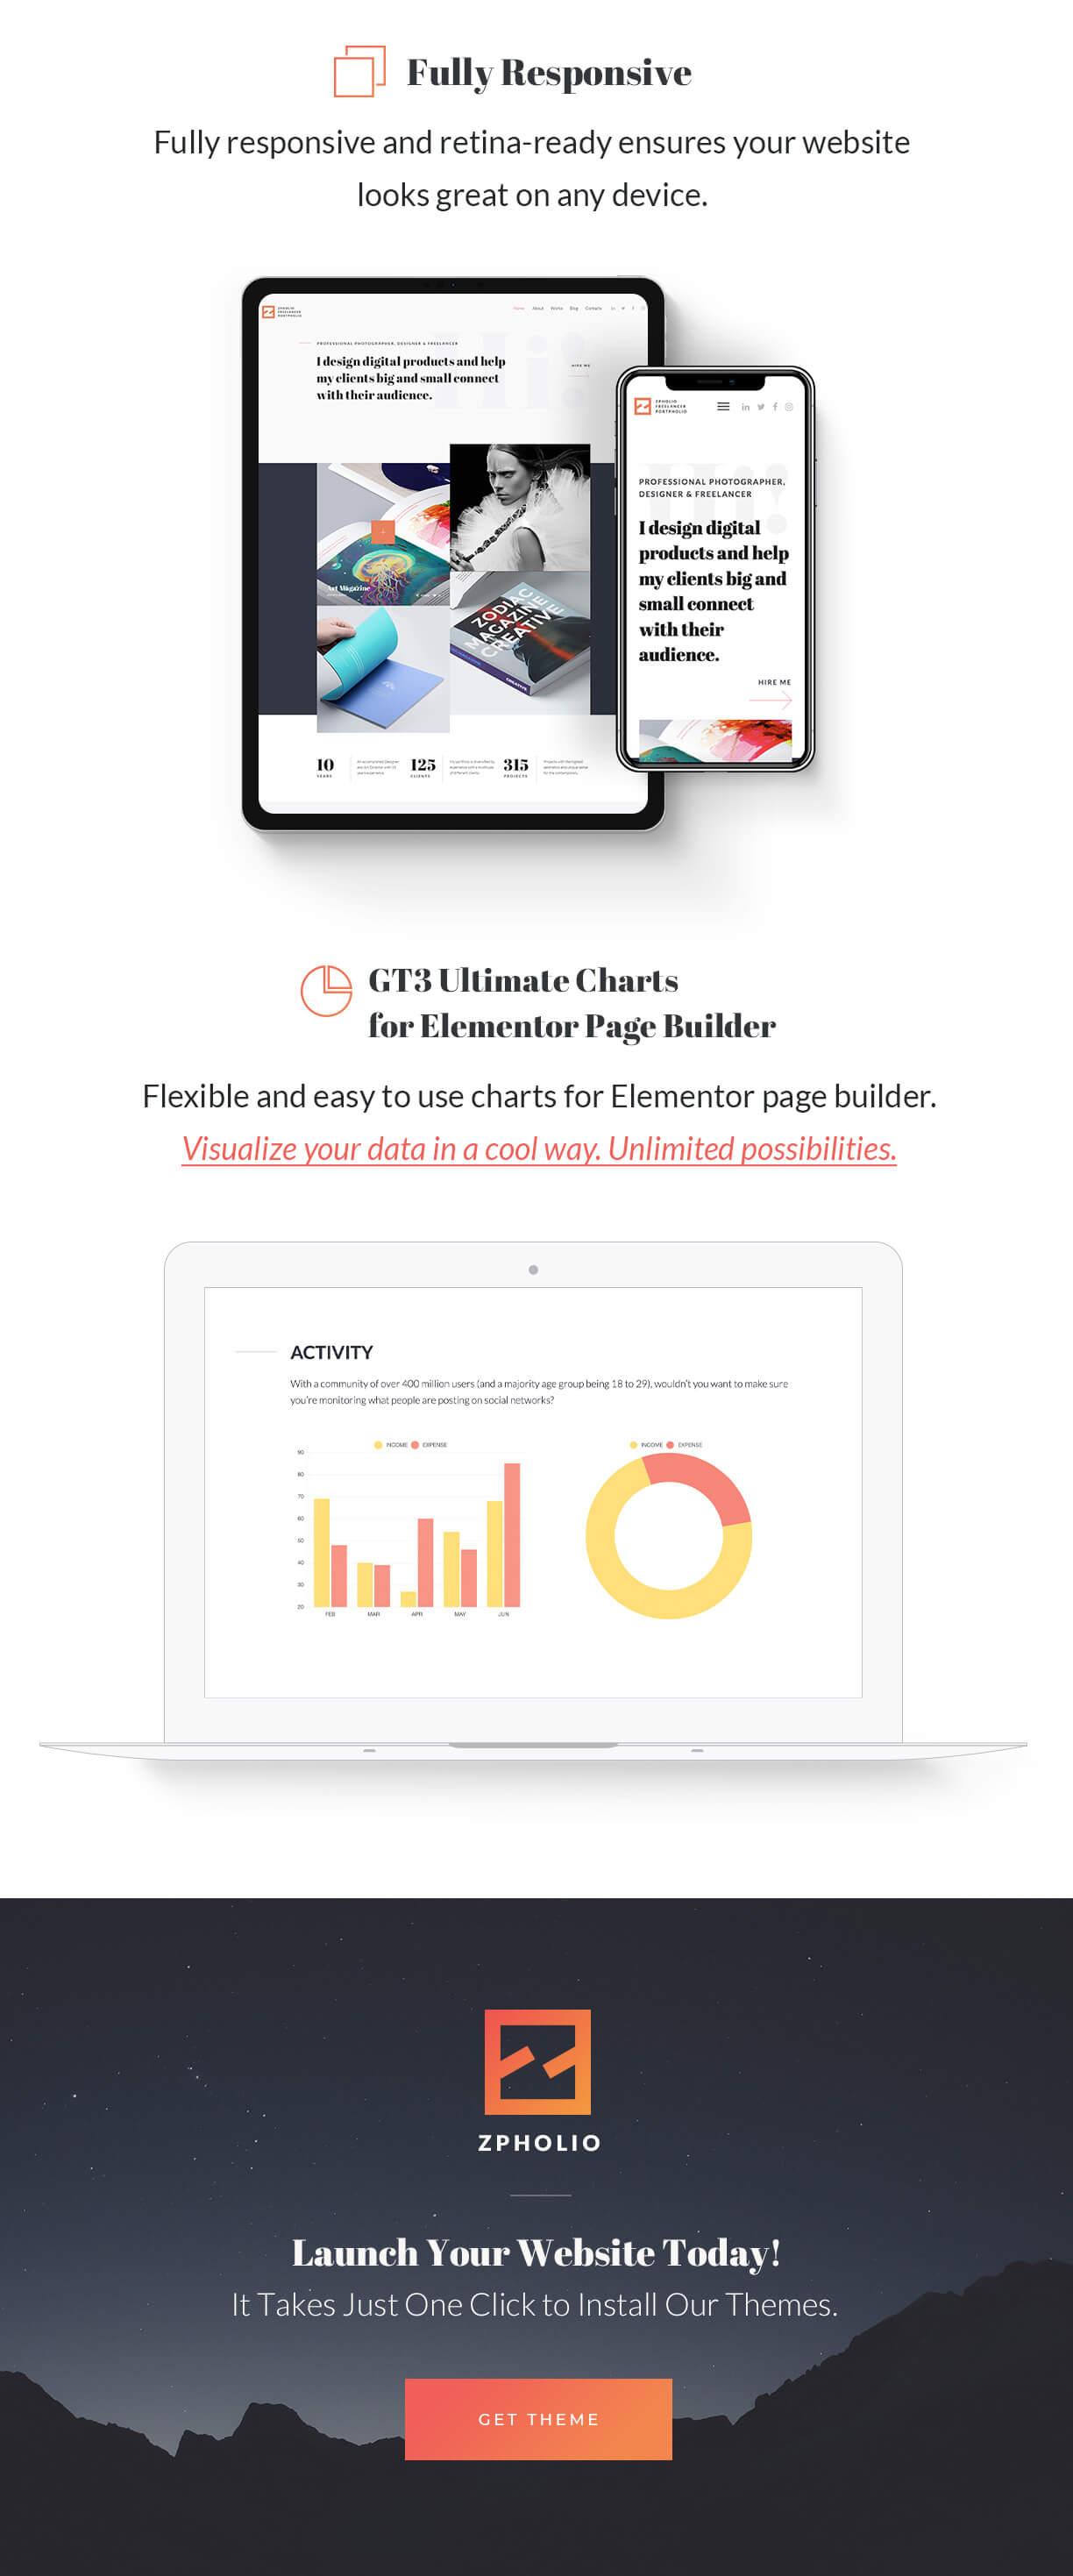 Elementor Creative Portfolio WordPress Theme - Zpholio - 6